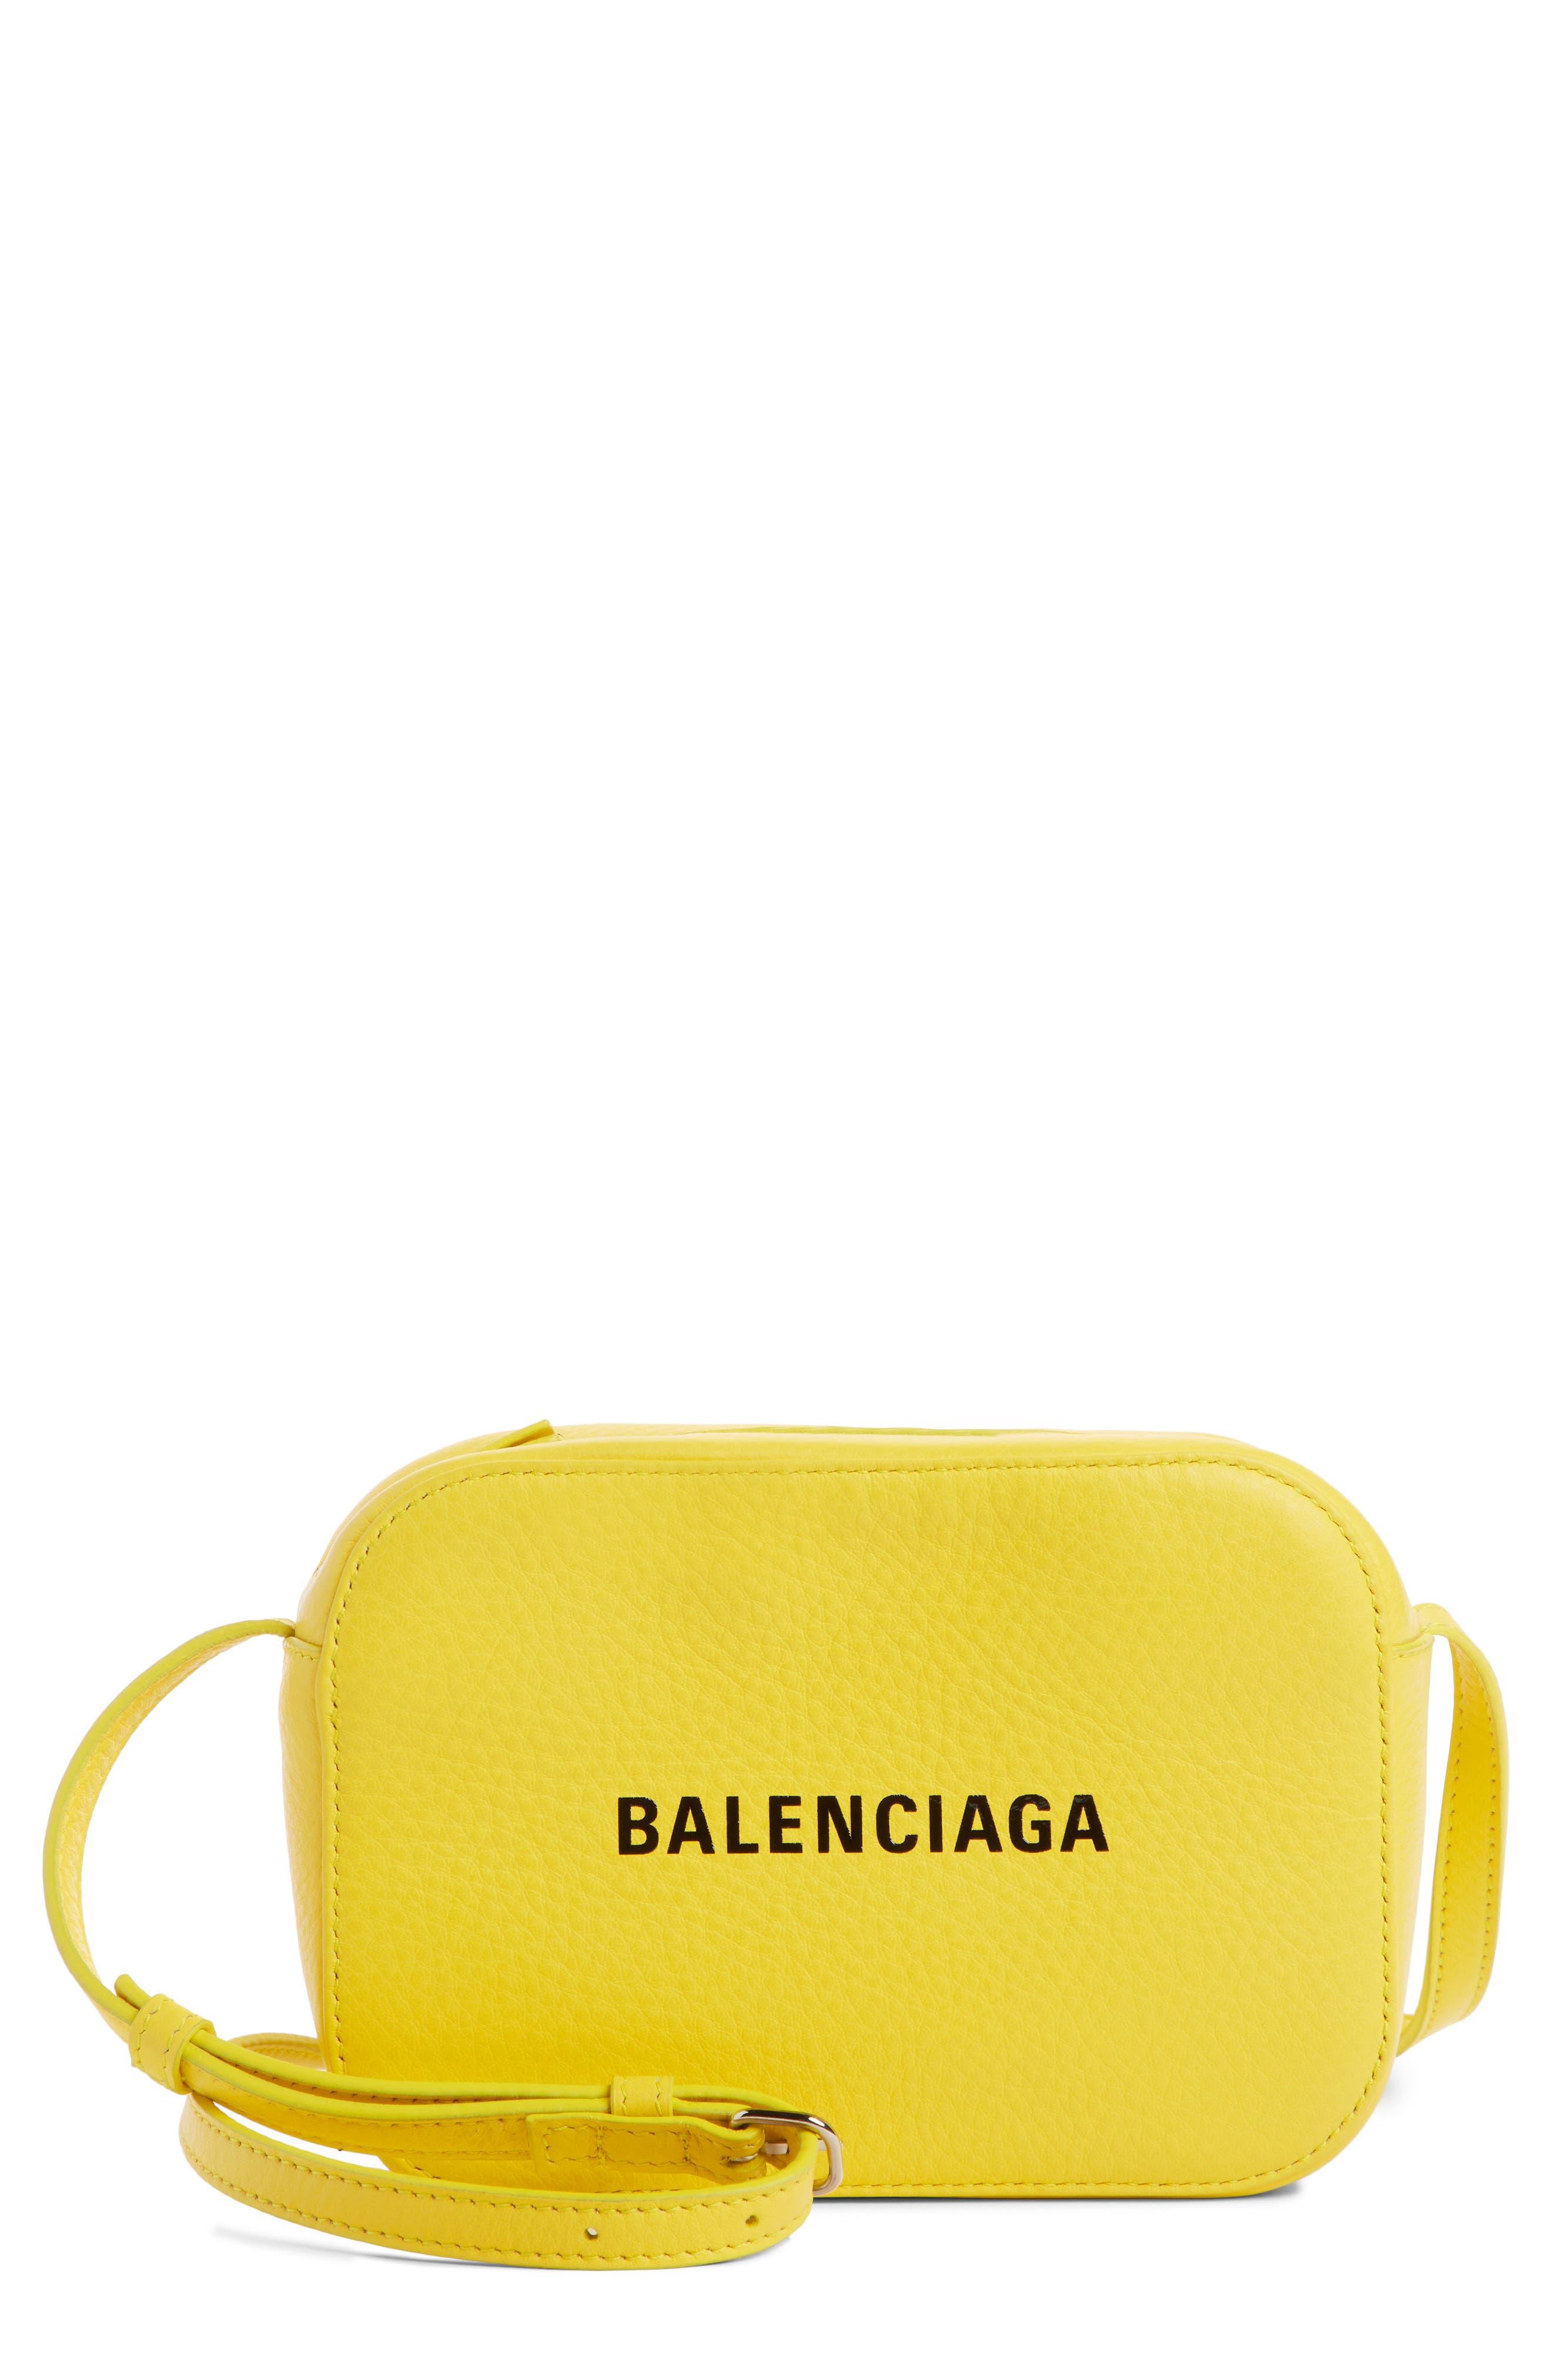 BALENCIAGA,                             Extra Small Everyday Calfskin Camera Bag,                             Main thumbnail 1, color,                             JAUNE SOLEIL/ NOIR